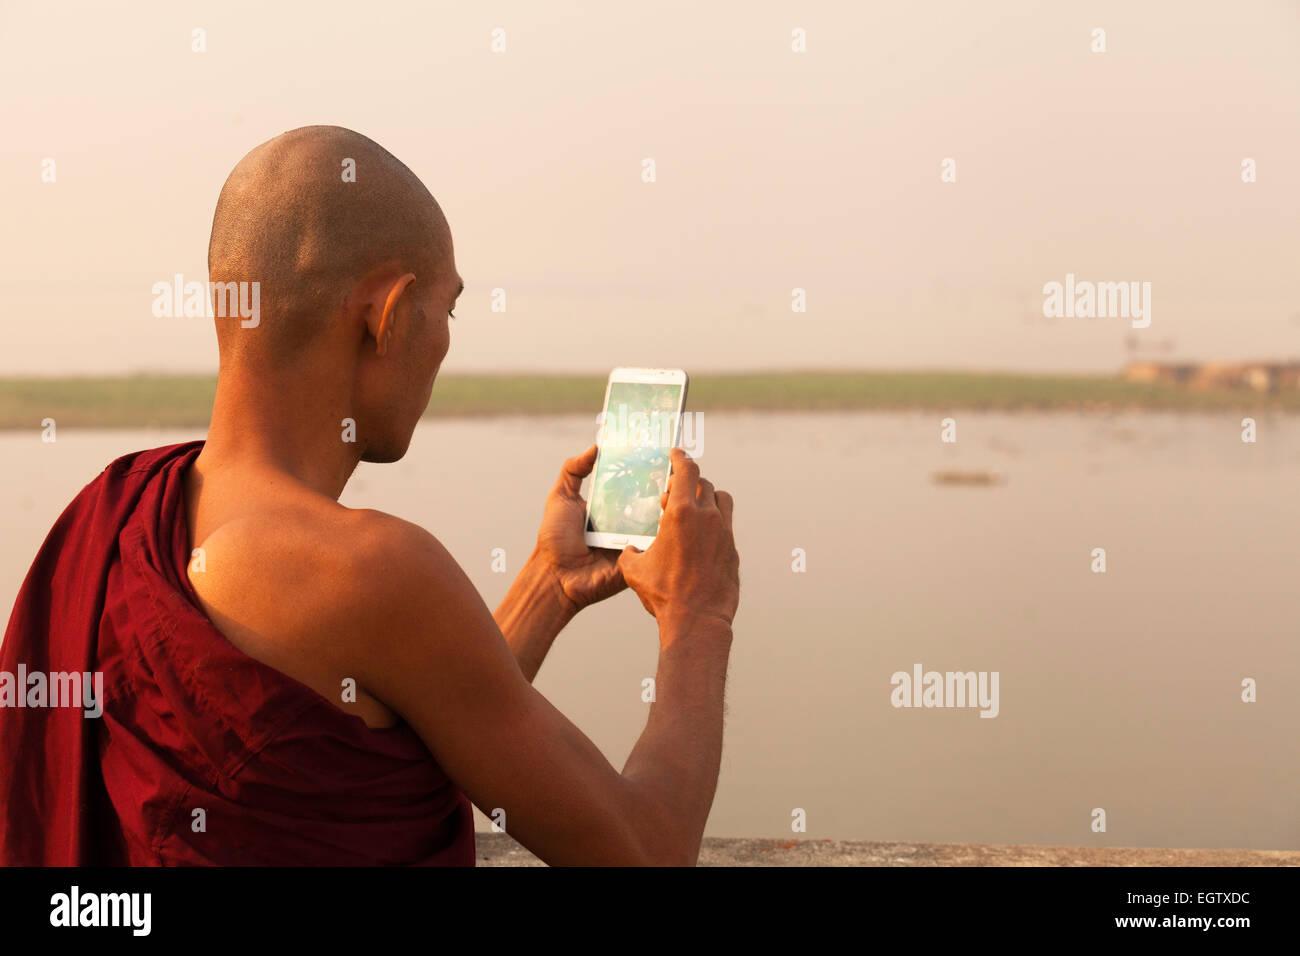 buddhist-monk-taking-a-photo-with-a-smartphone-mandalay-myanmar-burma-EGTXDC.jpg